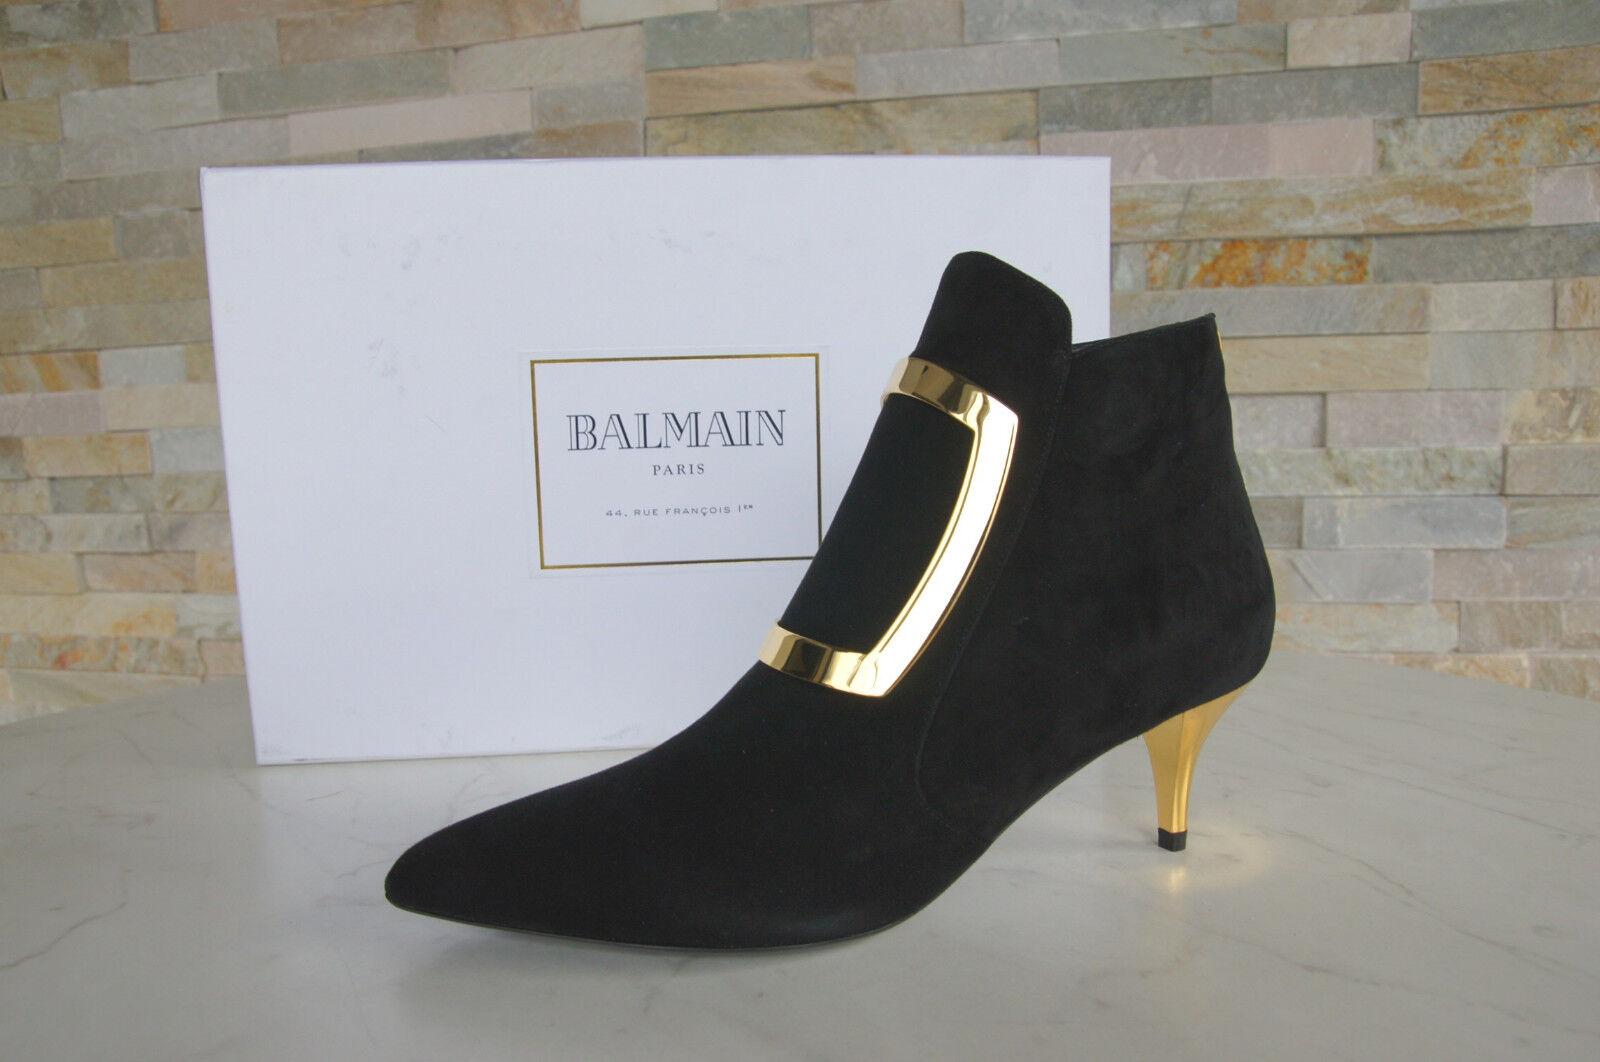 Balmain parís botines talla 36 botines zapatos zapatos zapatos negro nuevo ex. PVP  gran descuento